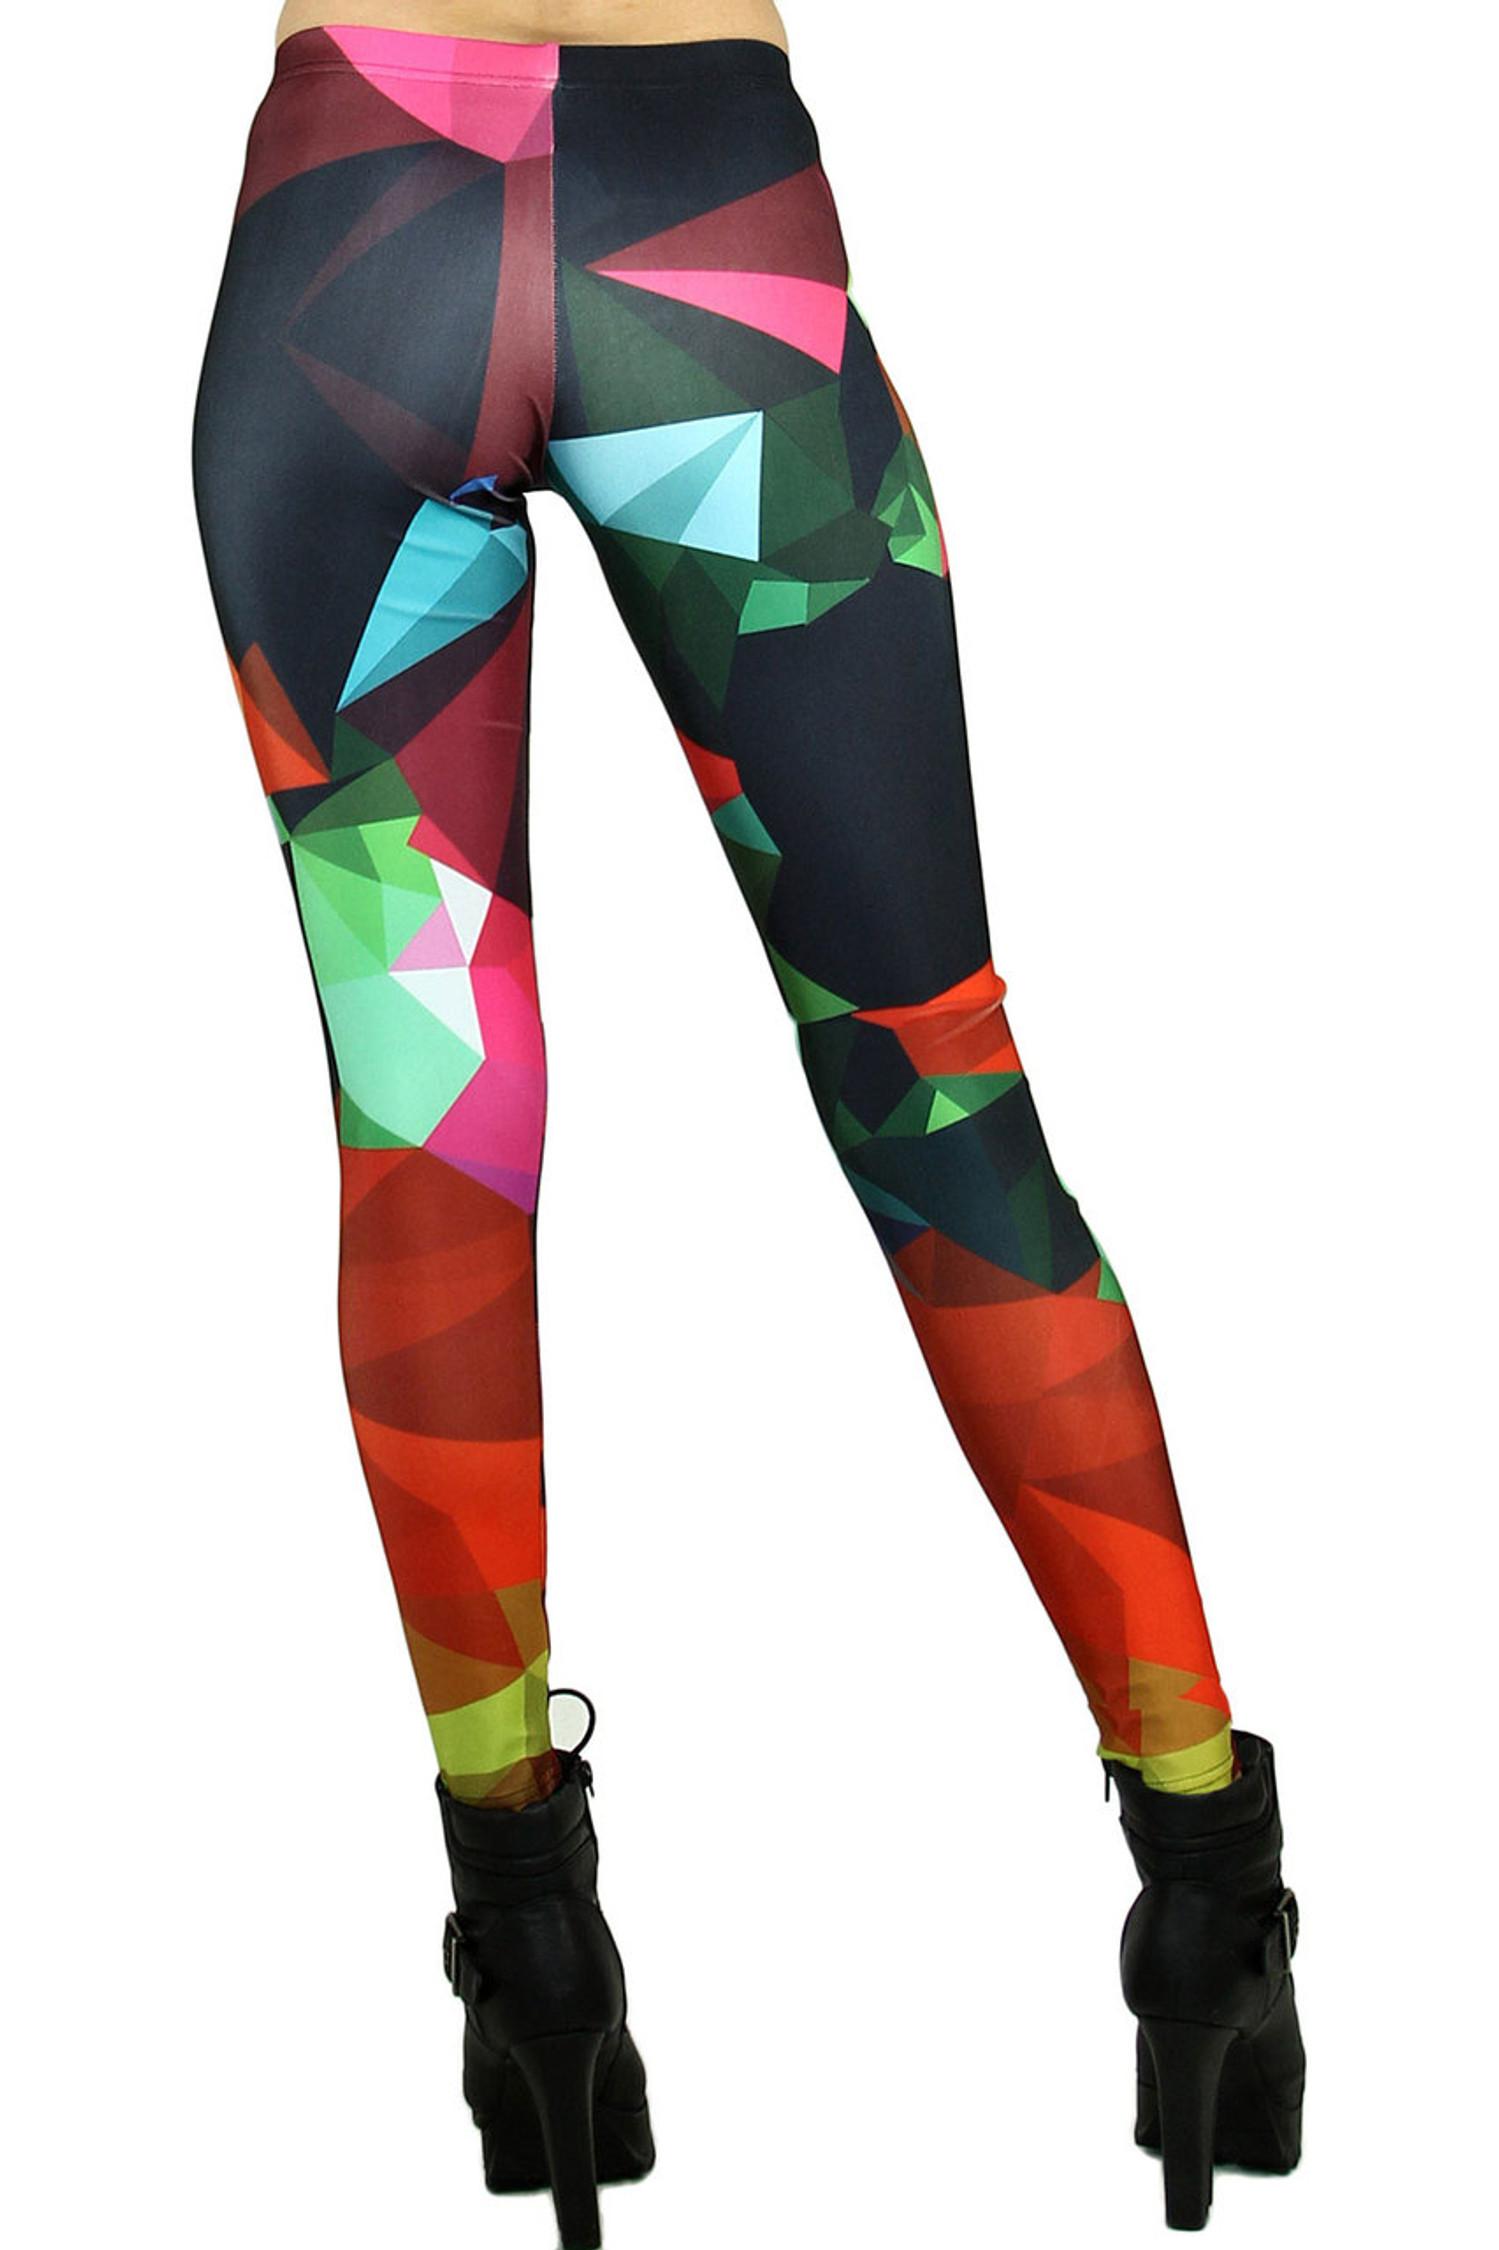 Sassy Colorful Shapes Leggings